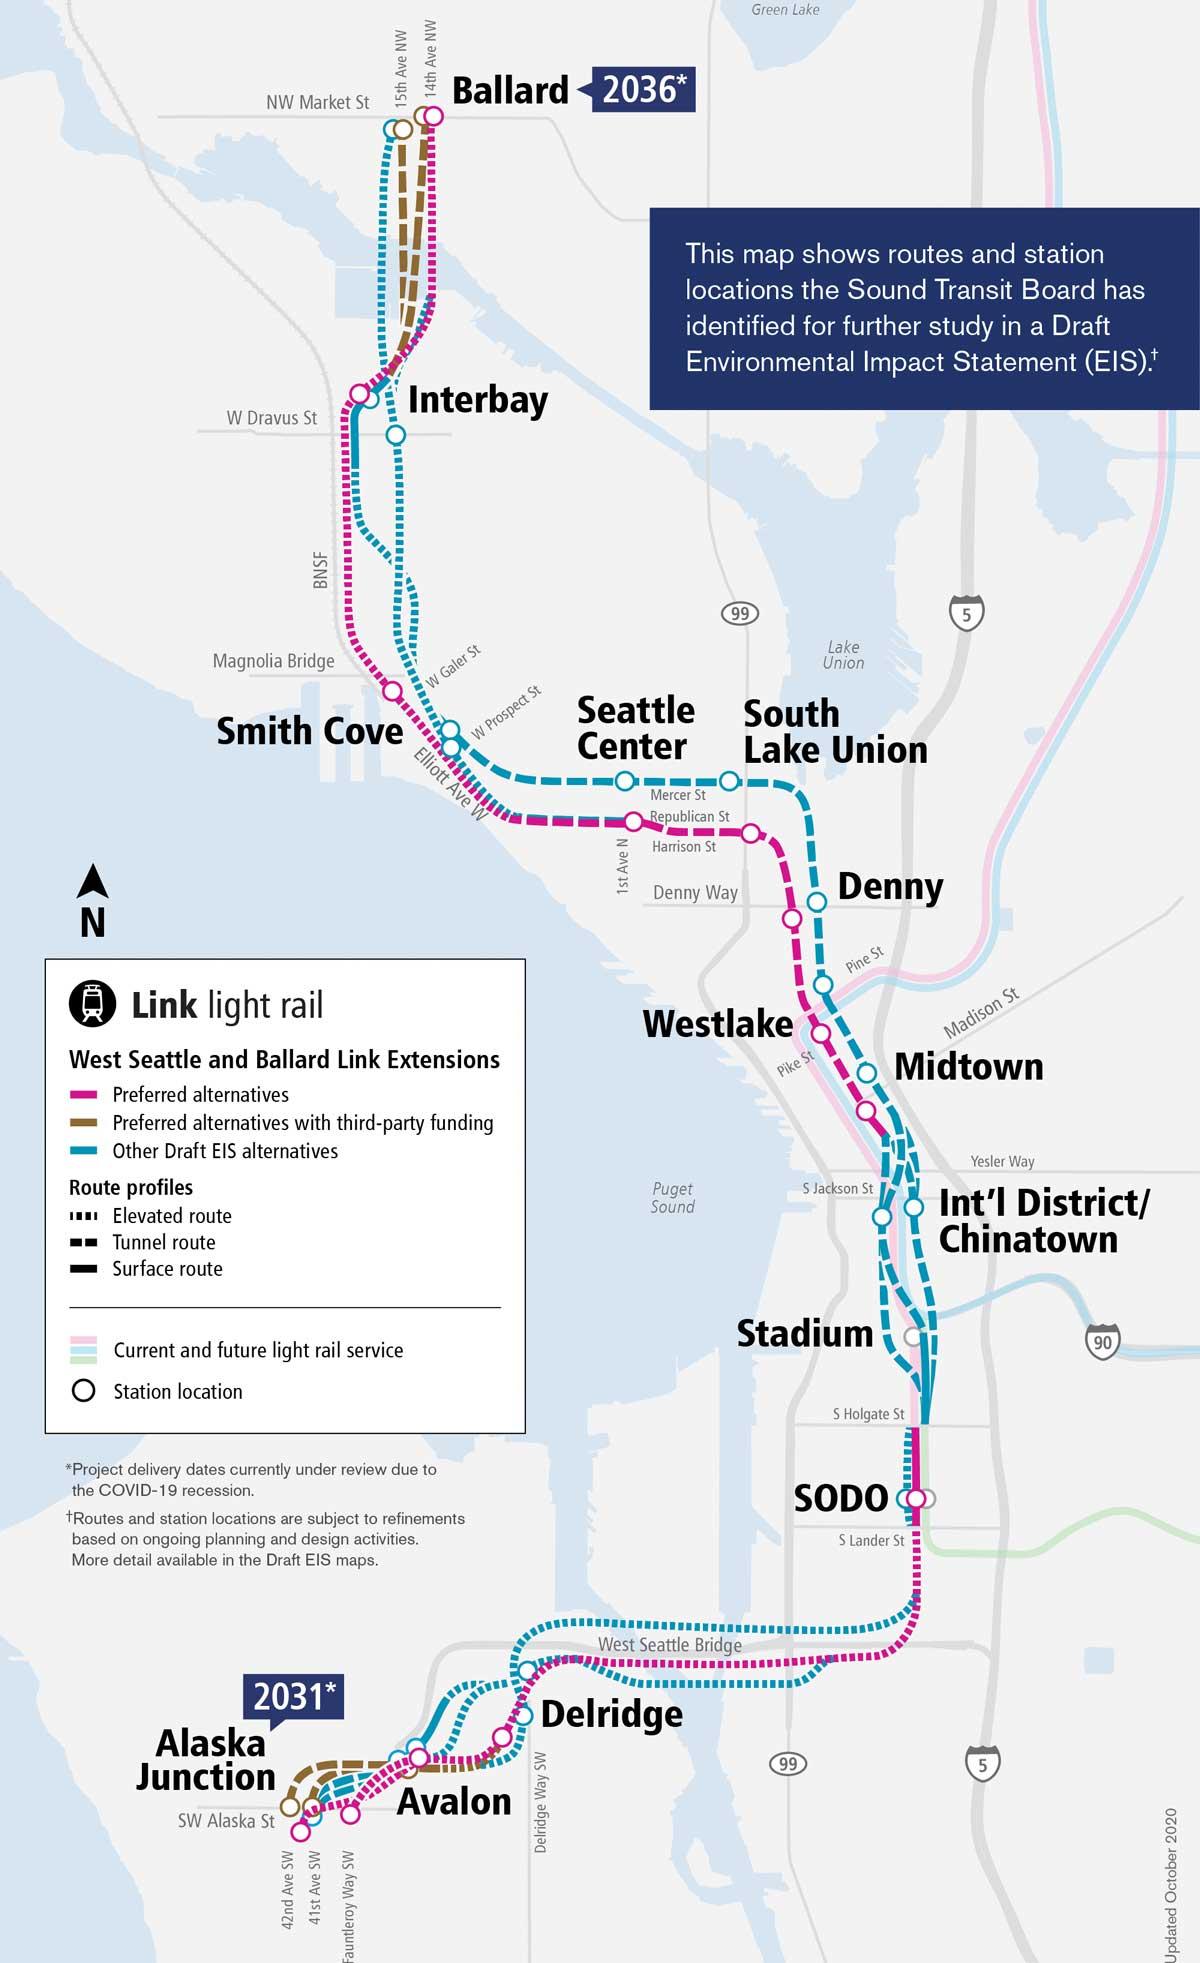 Seattle, Washington - West Seattle and Ballard Link Extensions